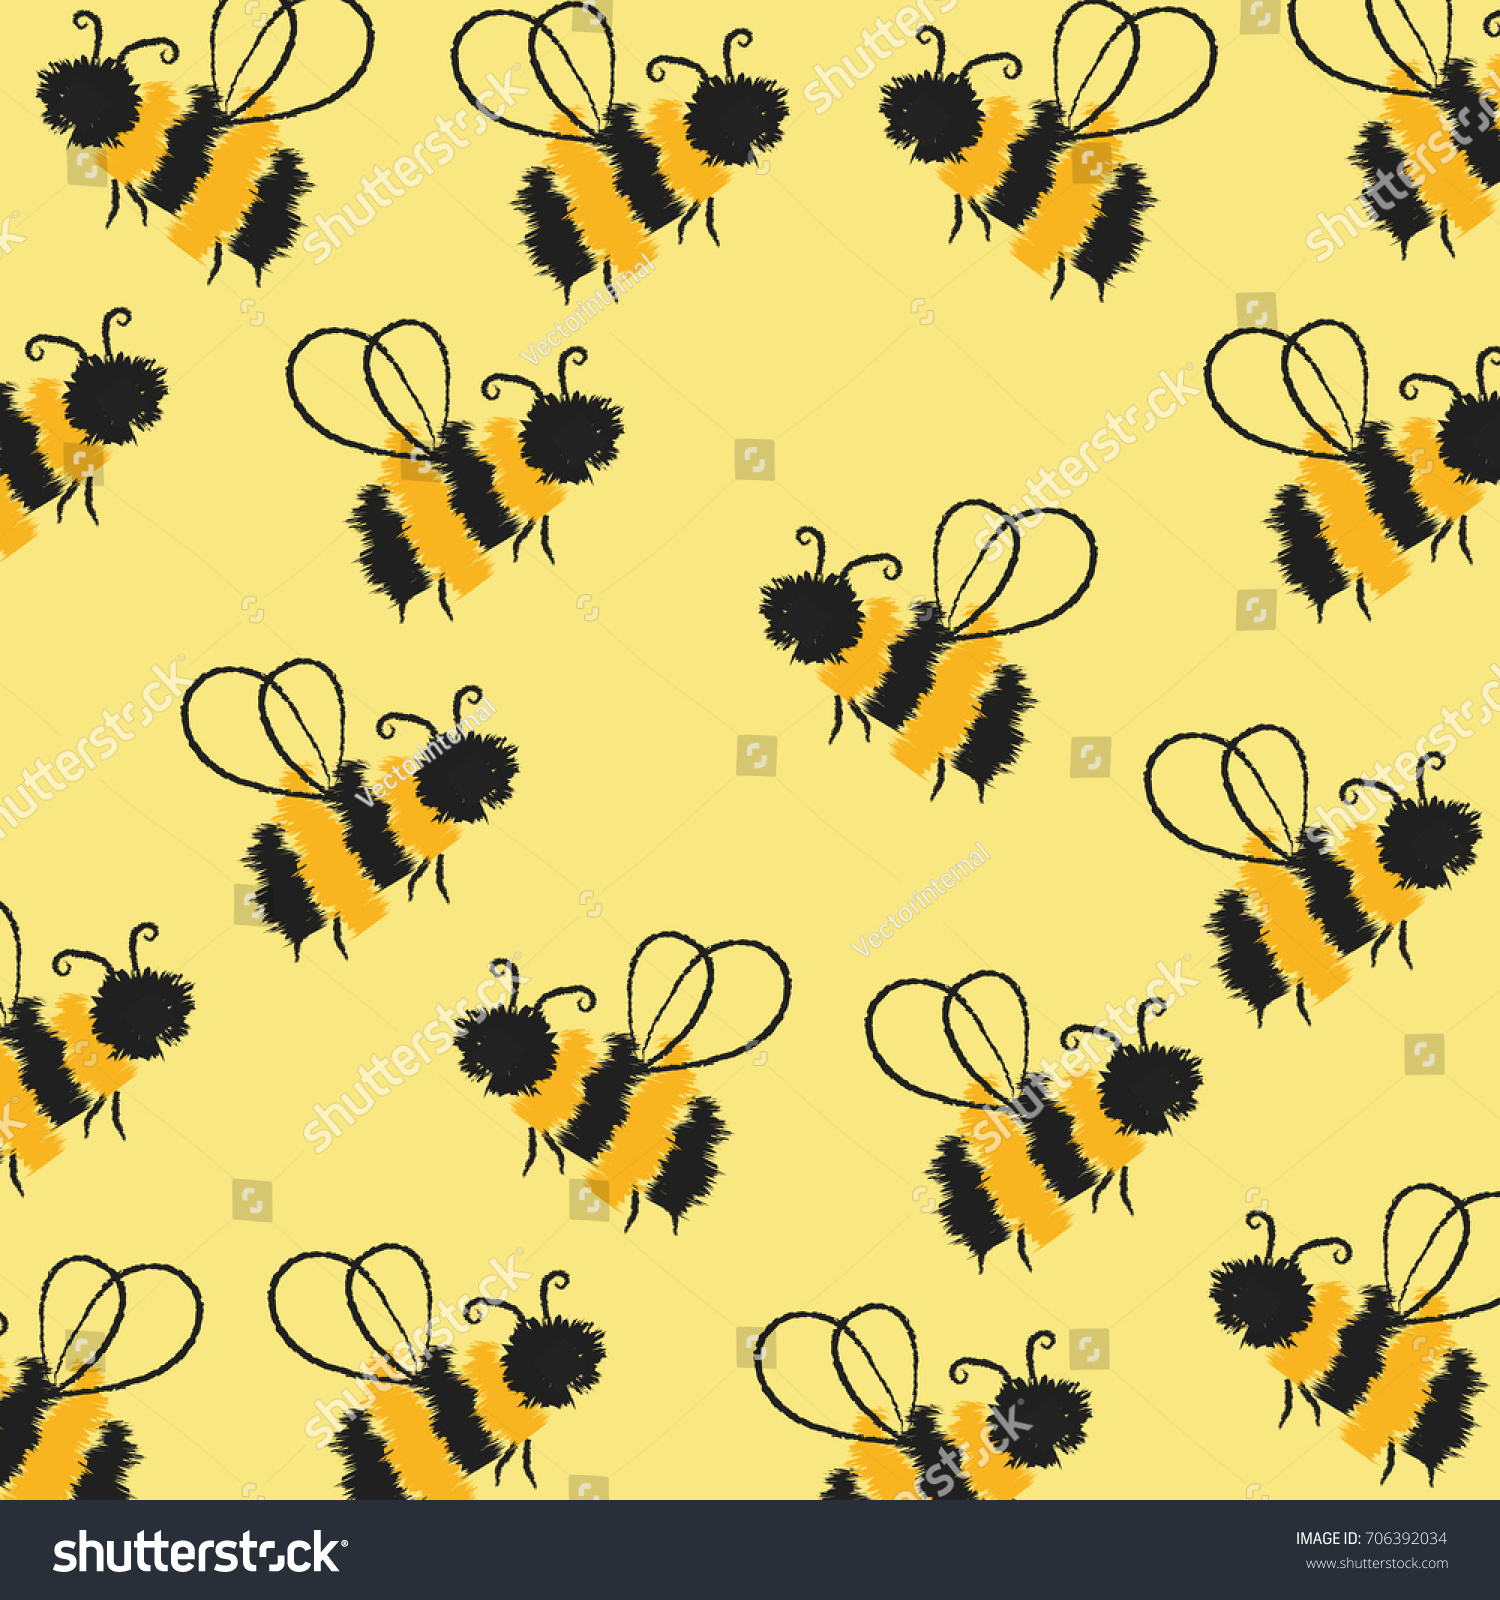 Autumn Vintage Pattern Bees Textiletextureprintsfabric Wallpaper